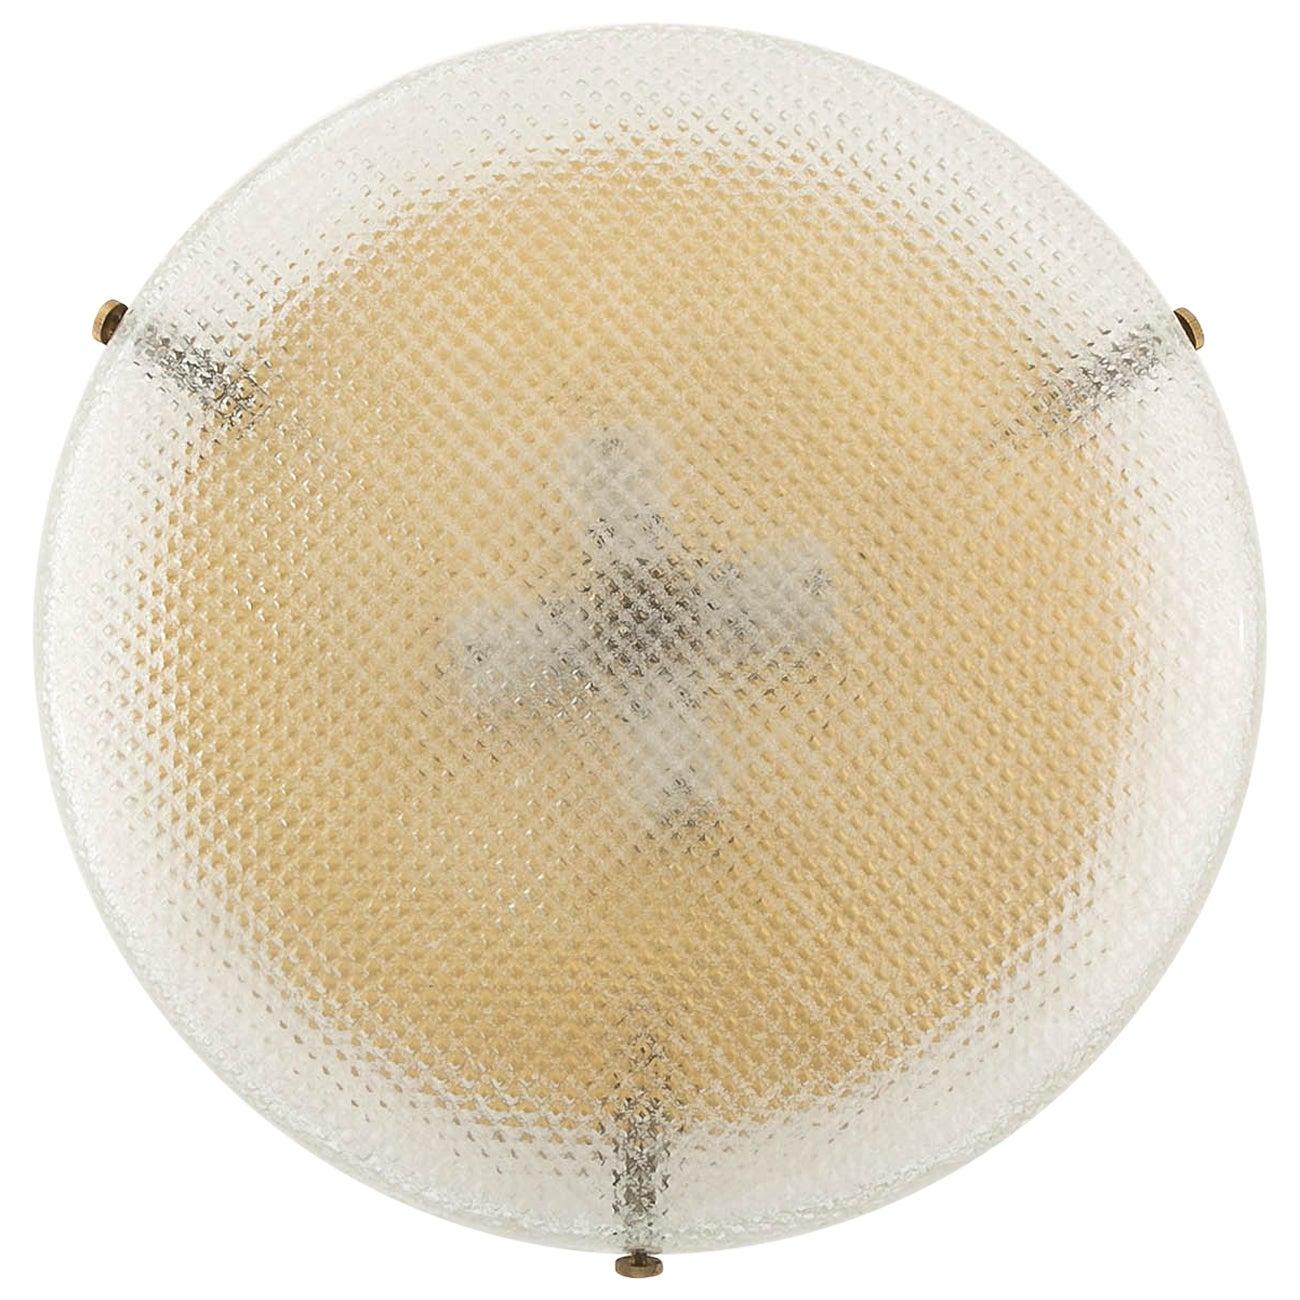 Hillebrand Flush Mount or Wall Light Fixture, Brass Square Pattern Glass, 1970